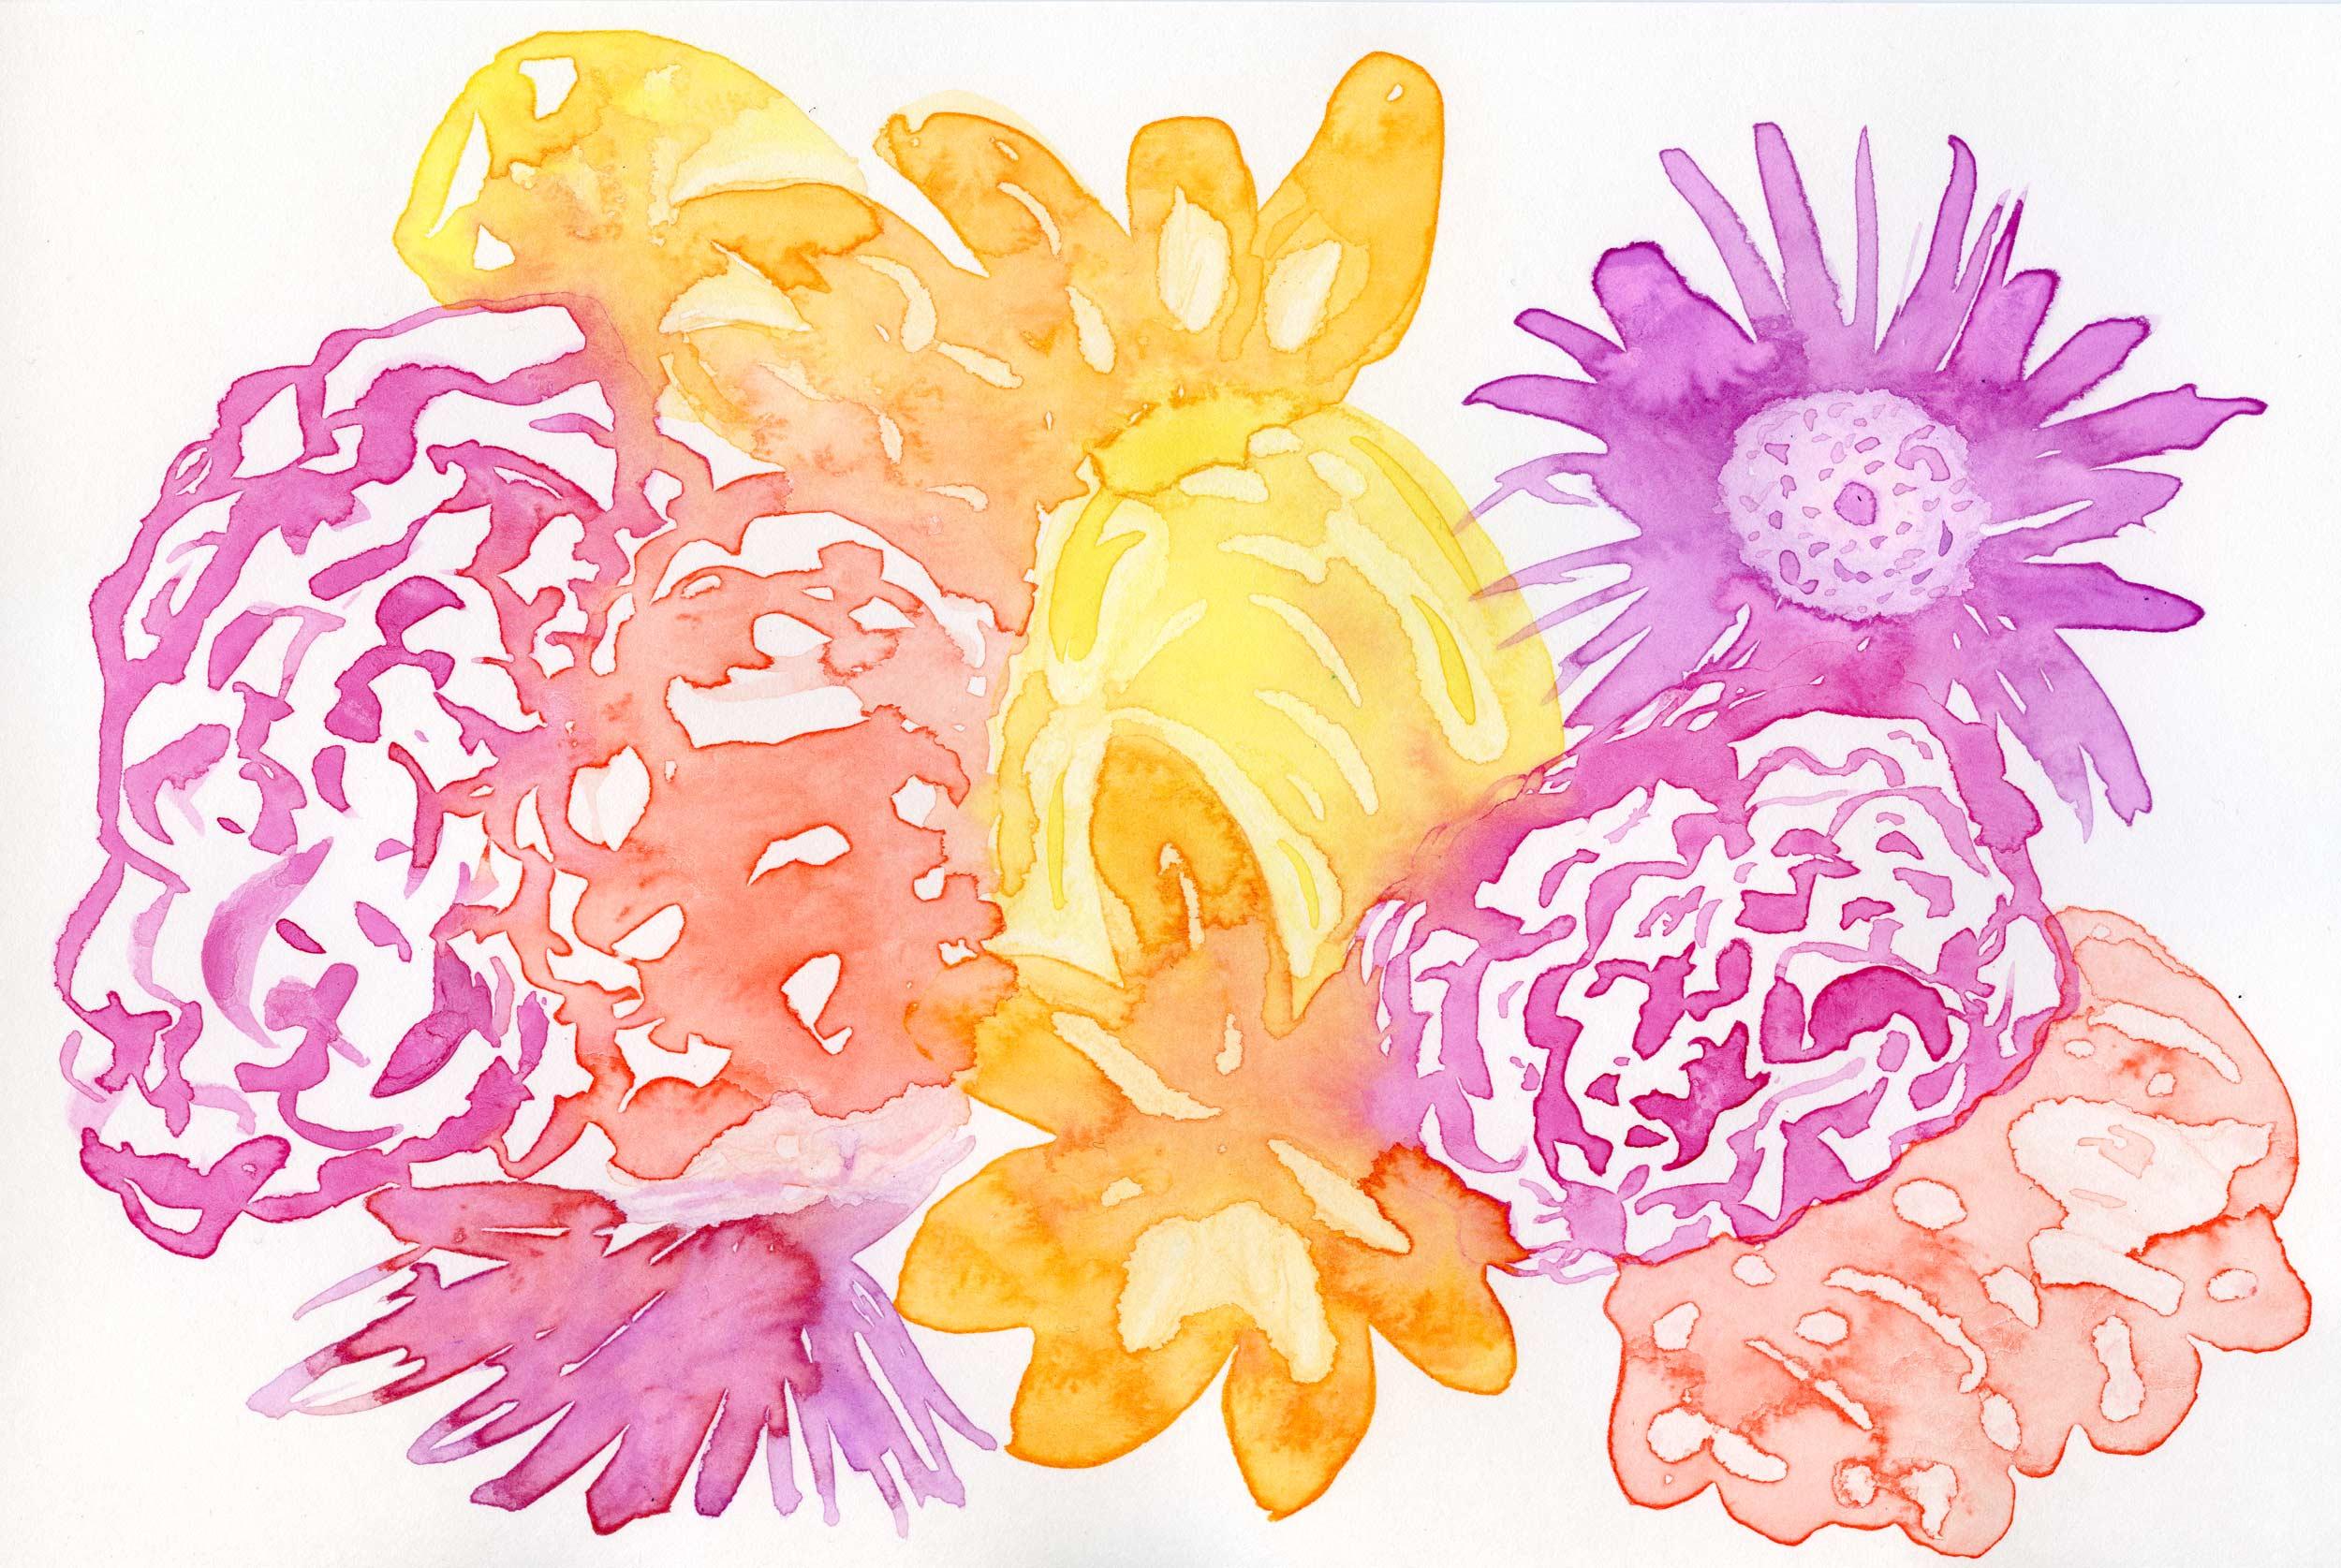 AbstractWatercolor-Florals-Warm.jpg